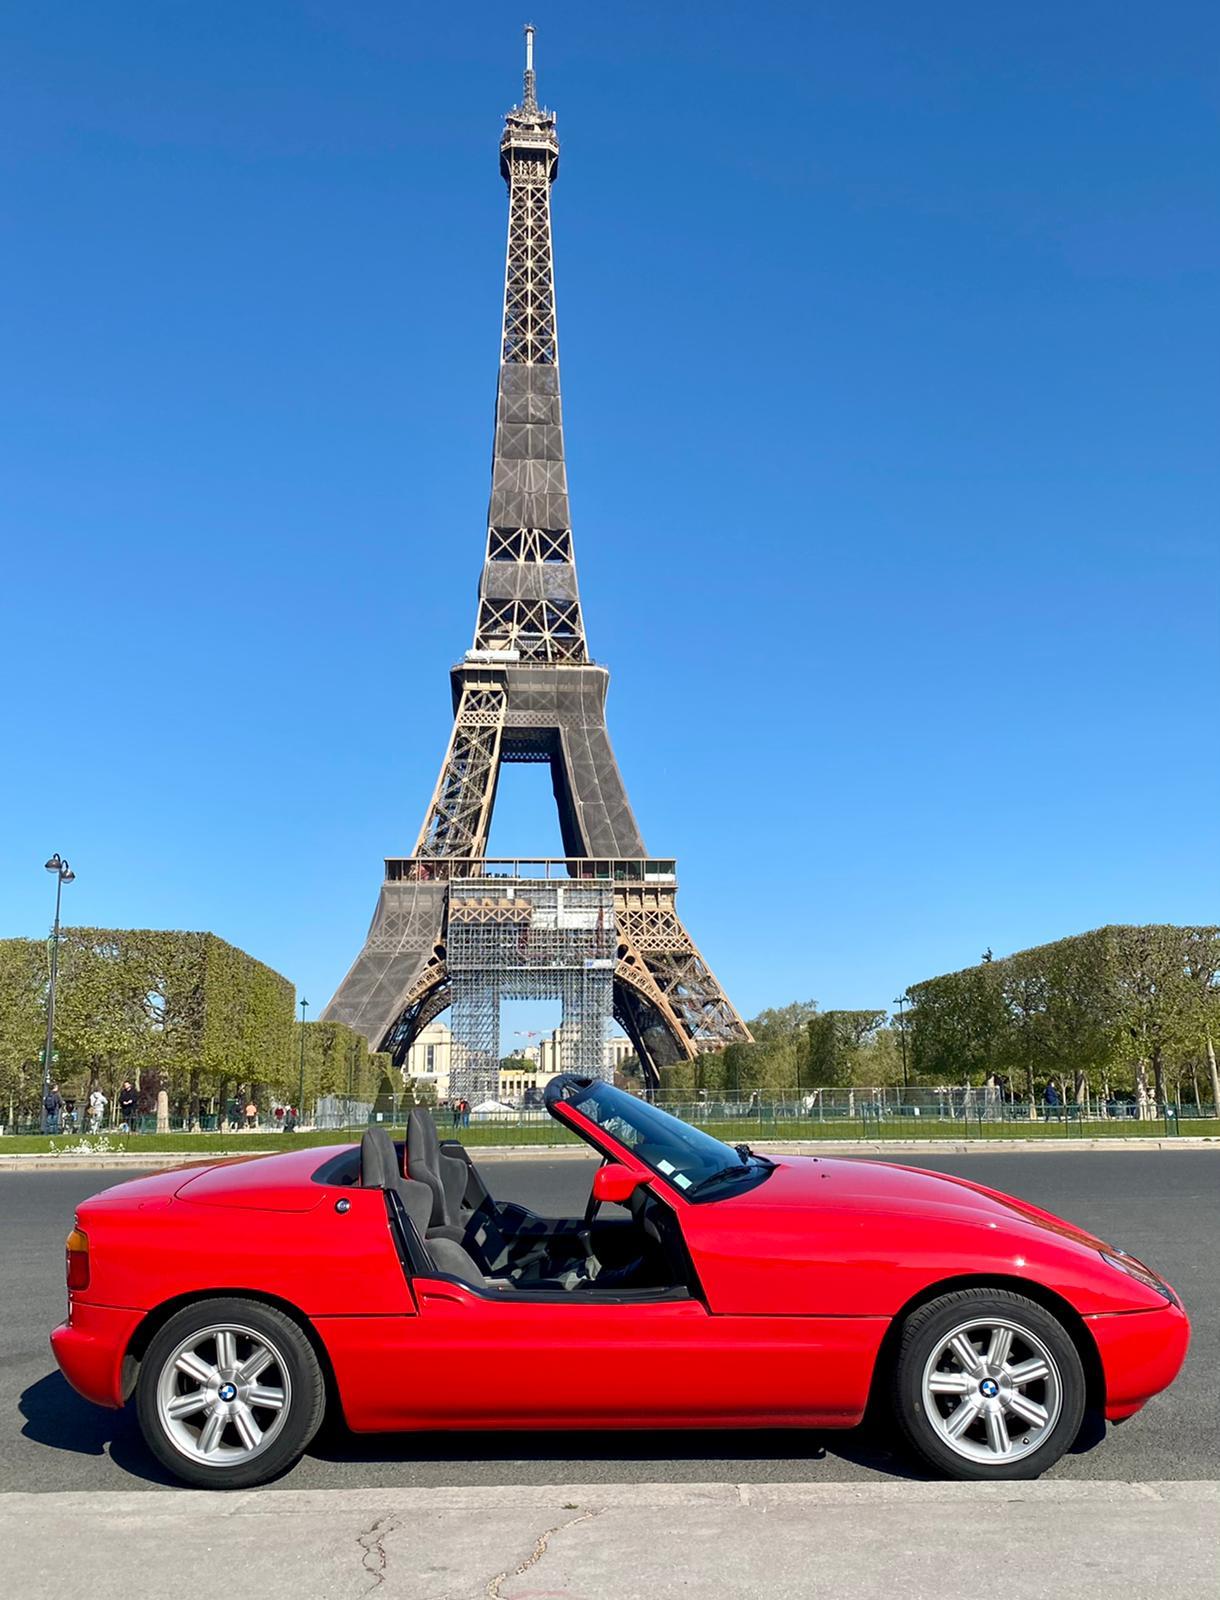 http://bmw-z1-france.com/clpimages/IMG-20210425-WA0007.jpg